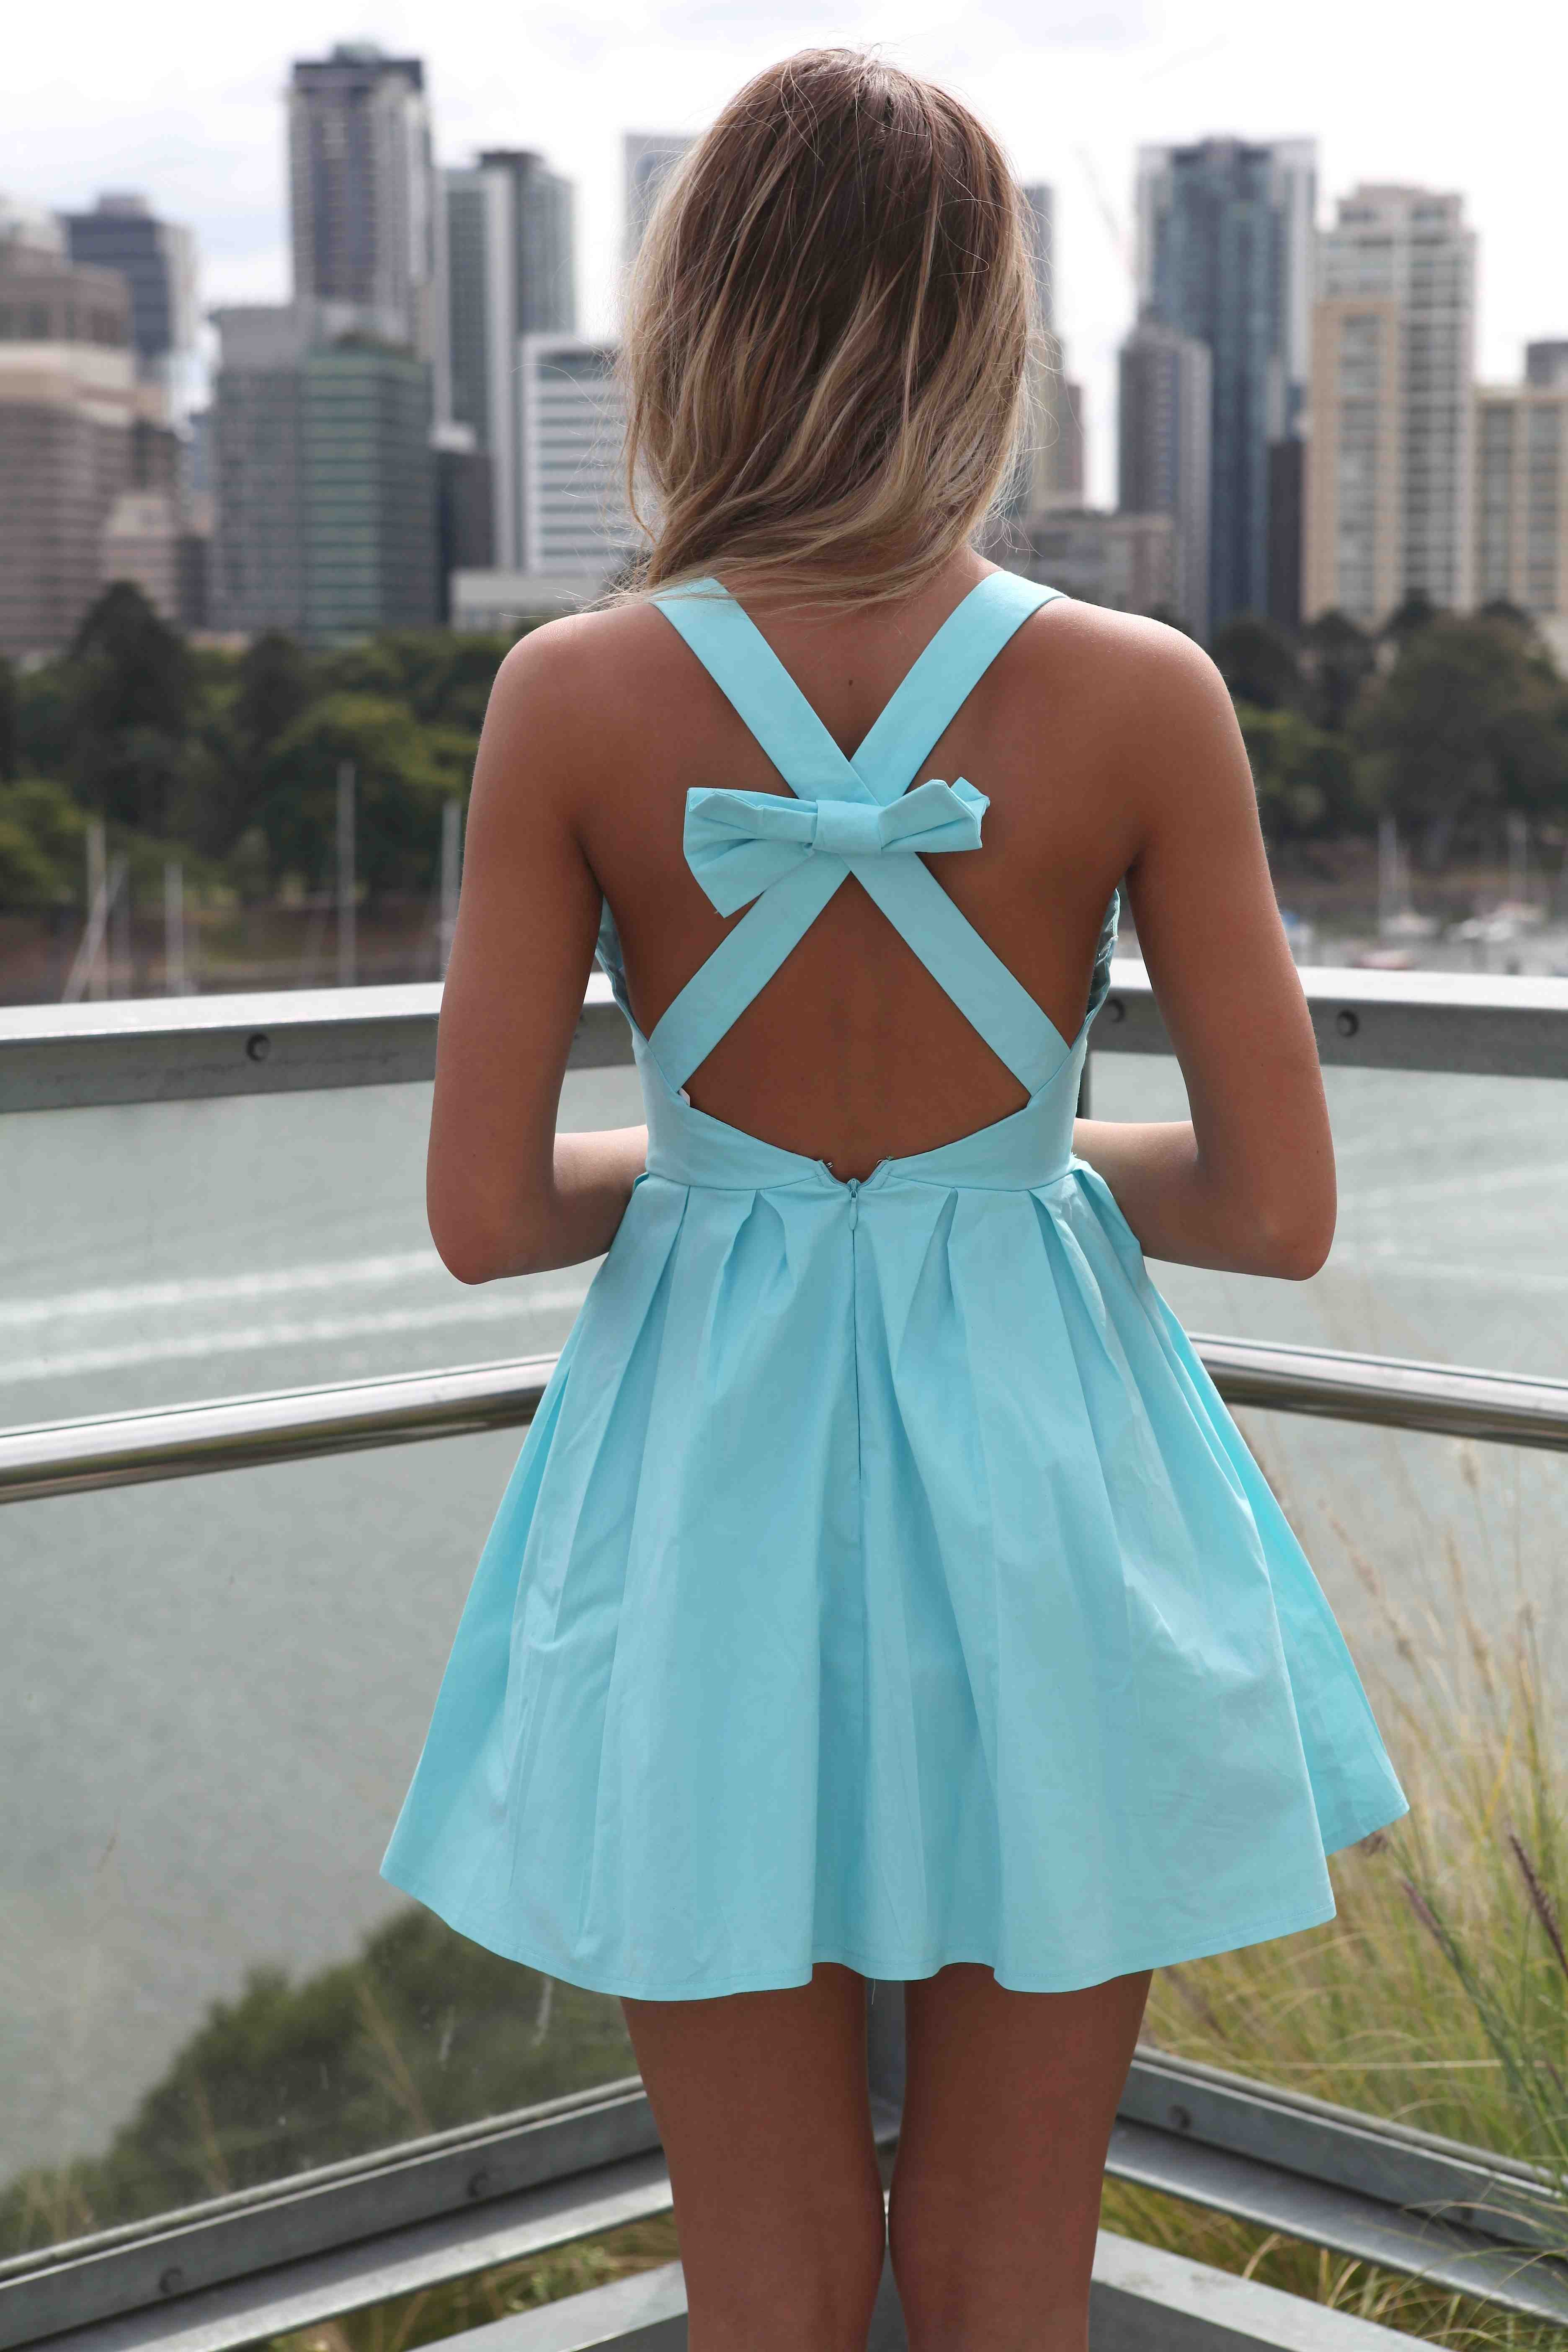 Blue Bow Back Dress PRE-ORDER | Fashiion On Fire